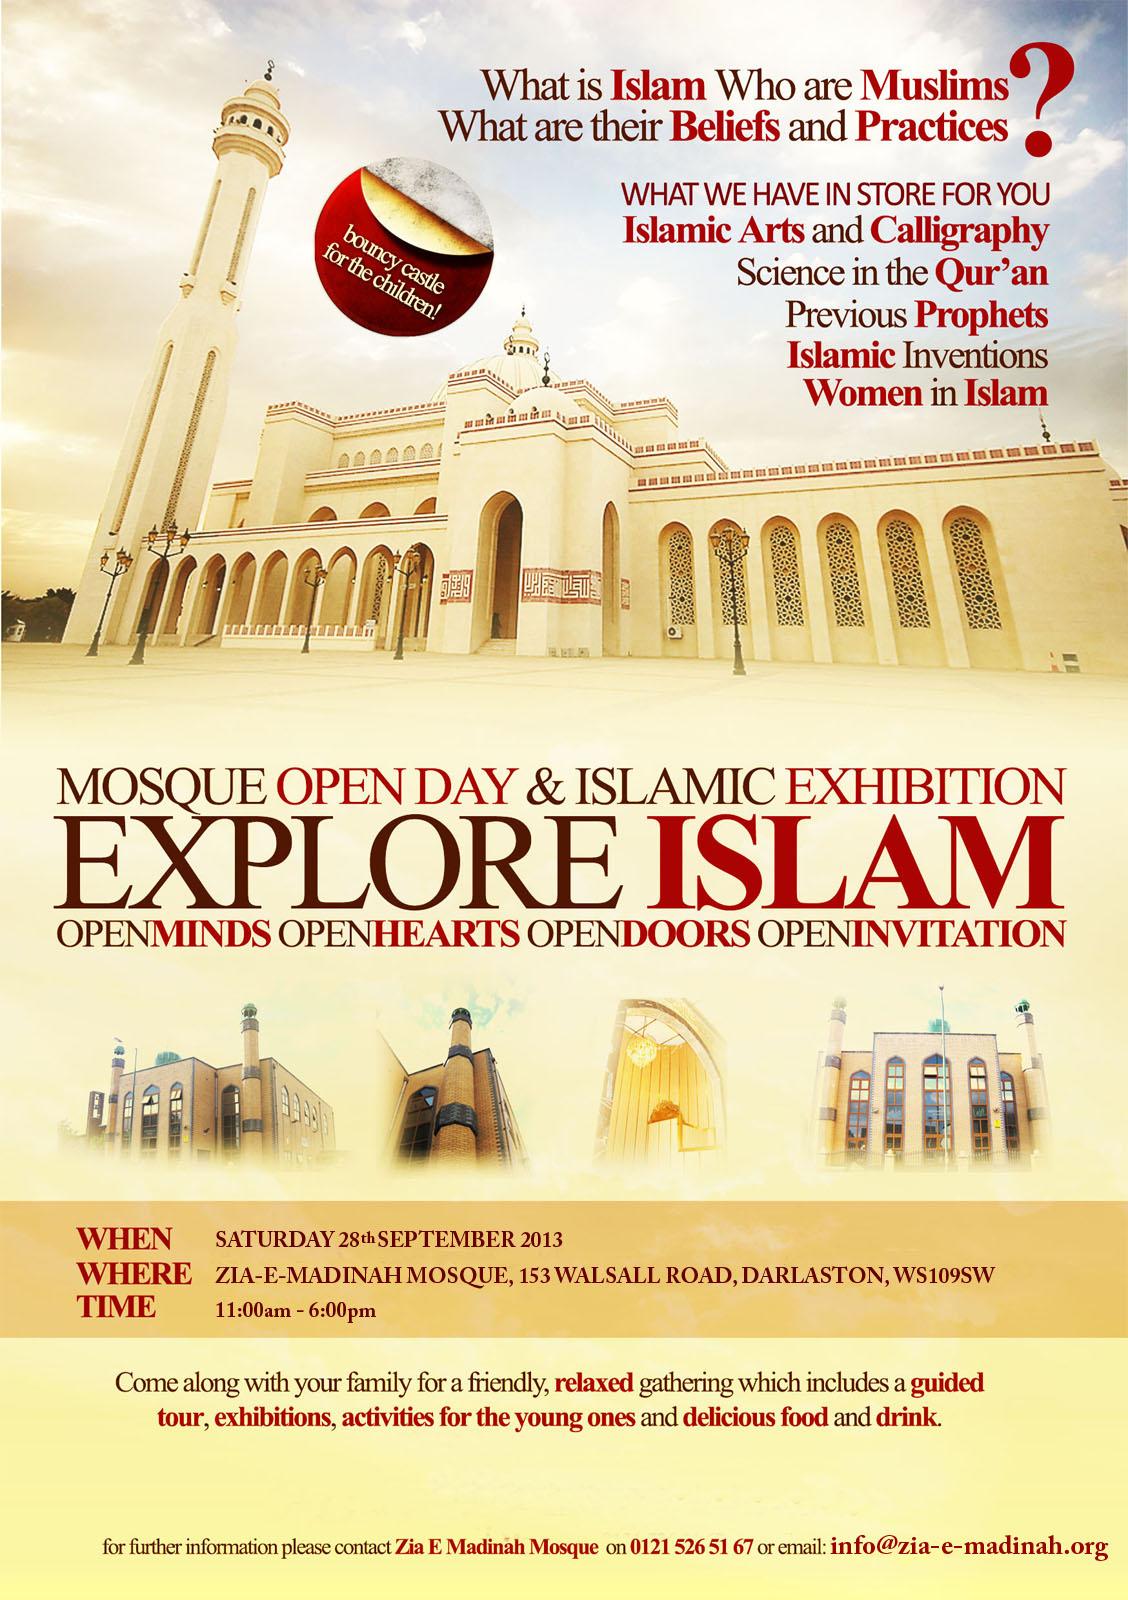 Explore Islam Darlaston West Midlands Paul Salahuddin Armstrong